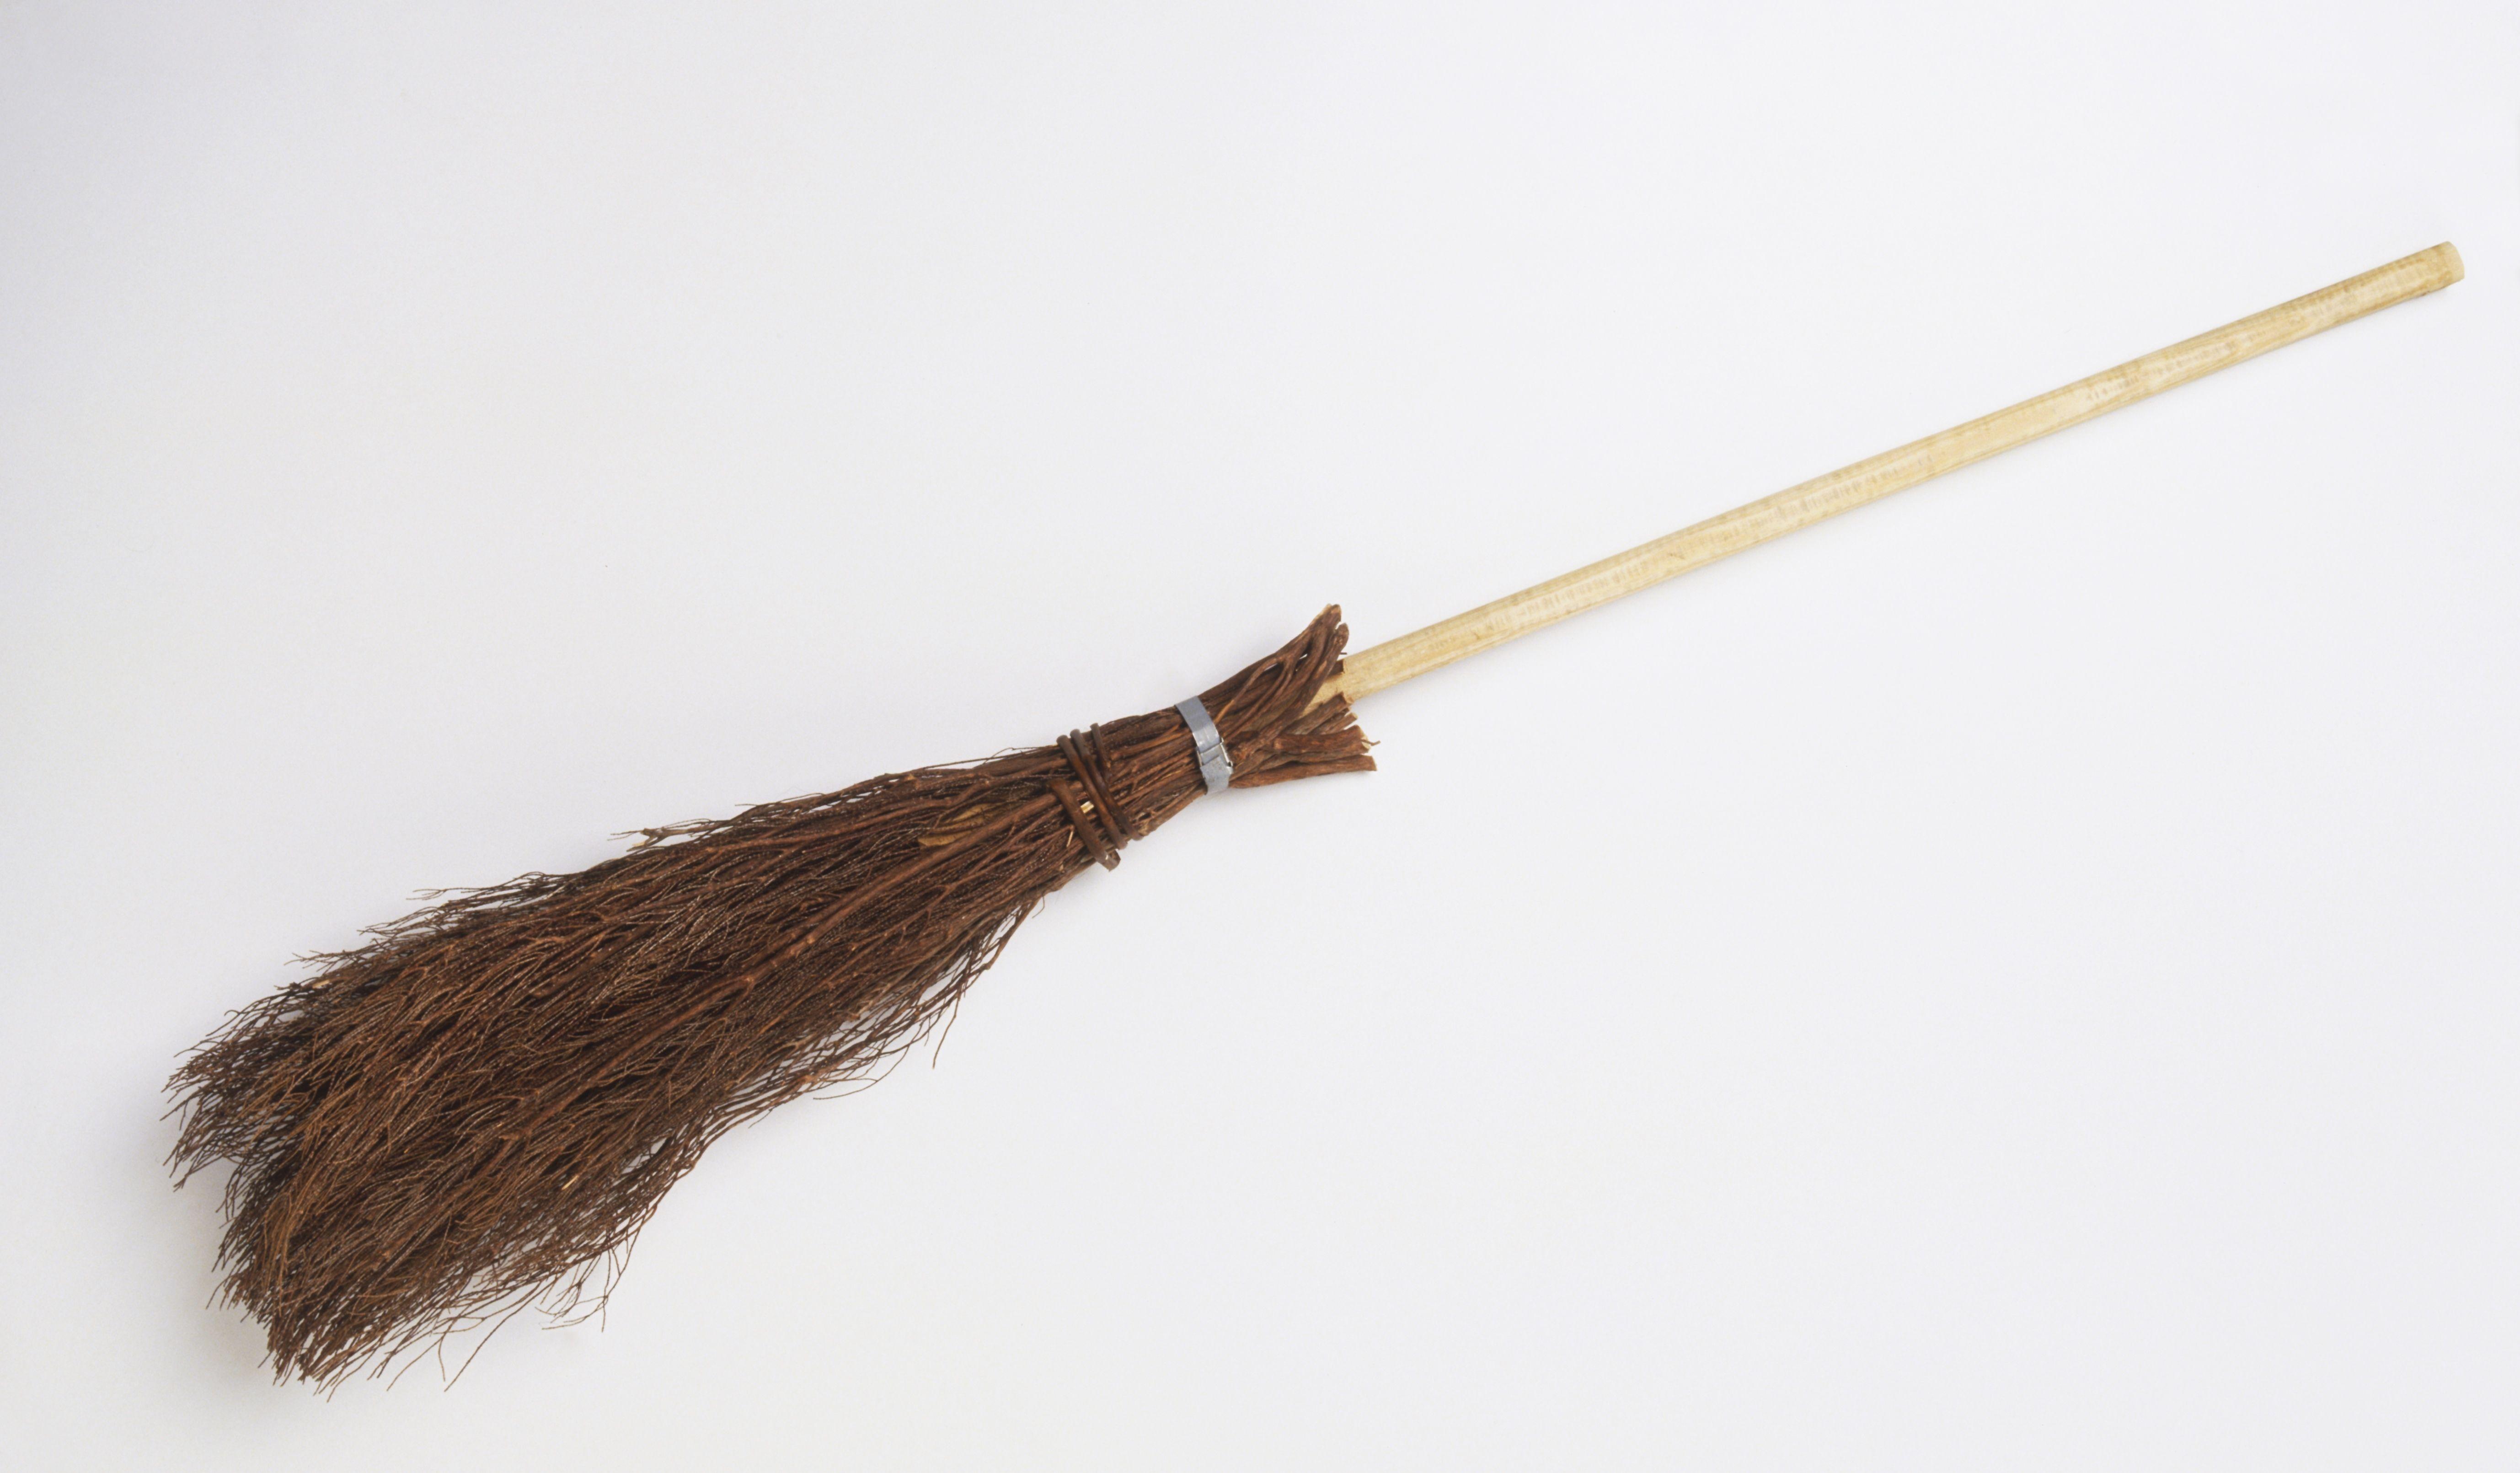 jonathan swift s classic essay on conversation classic essays jonathan swift s meditation upon a broomstick